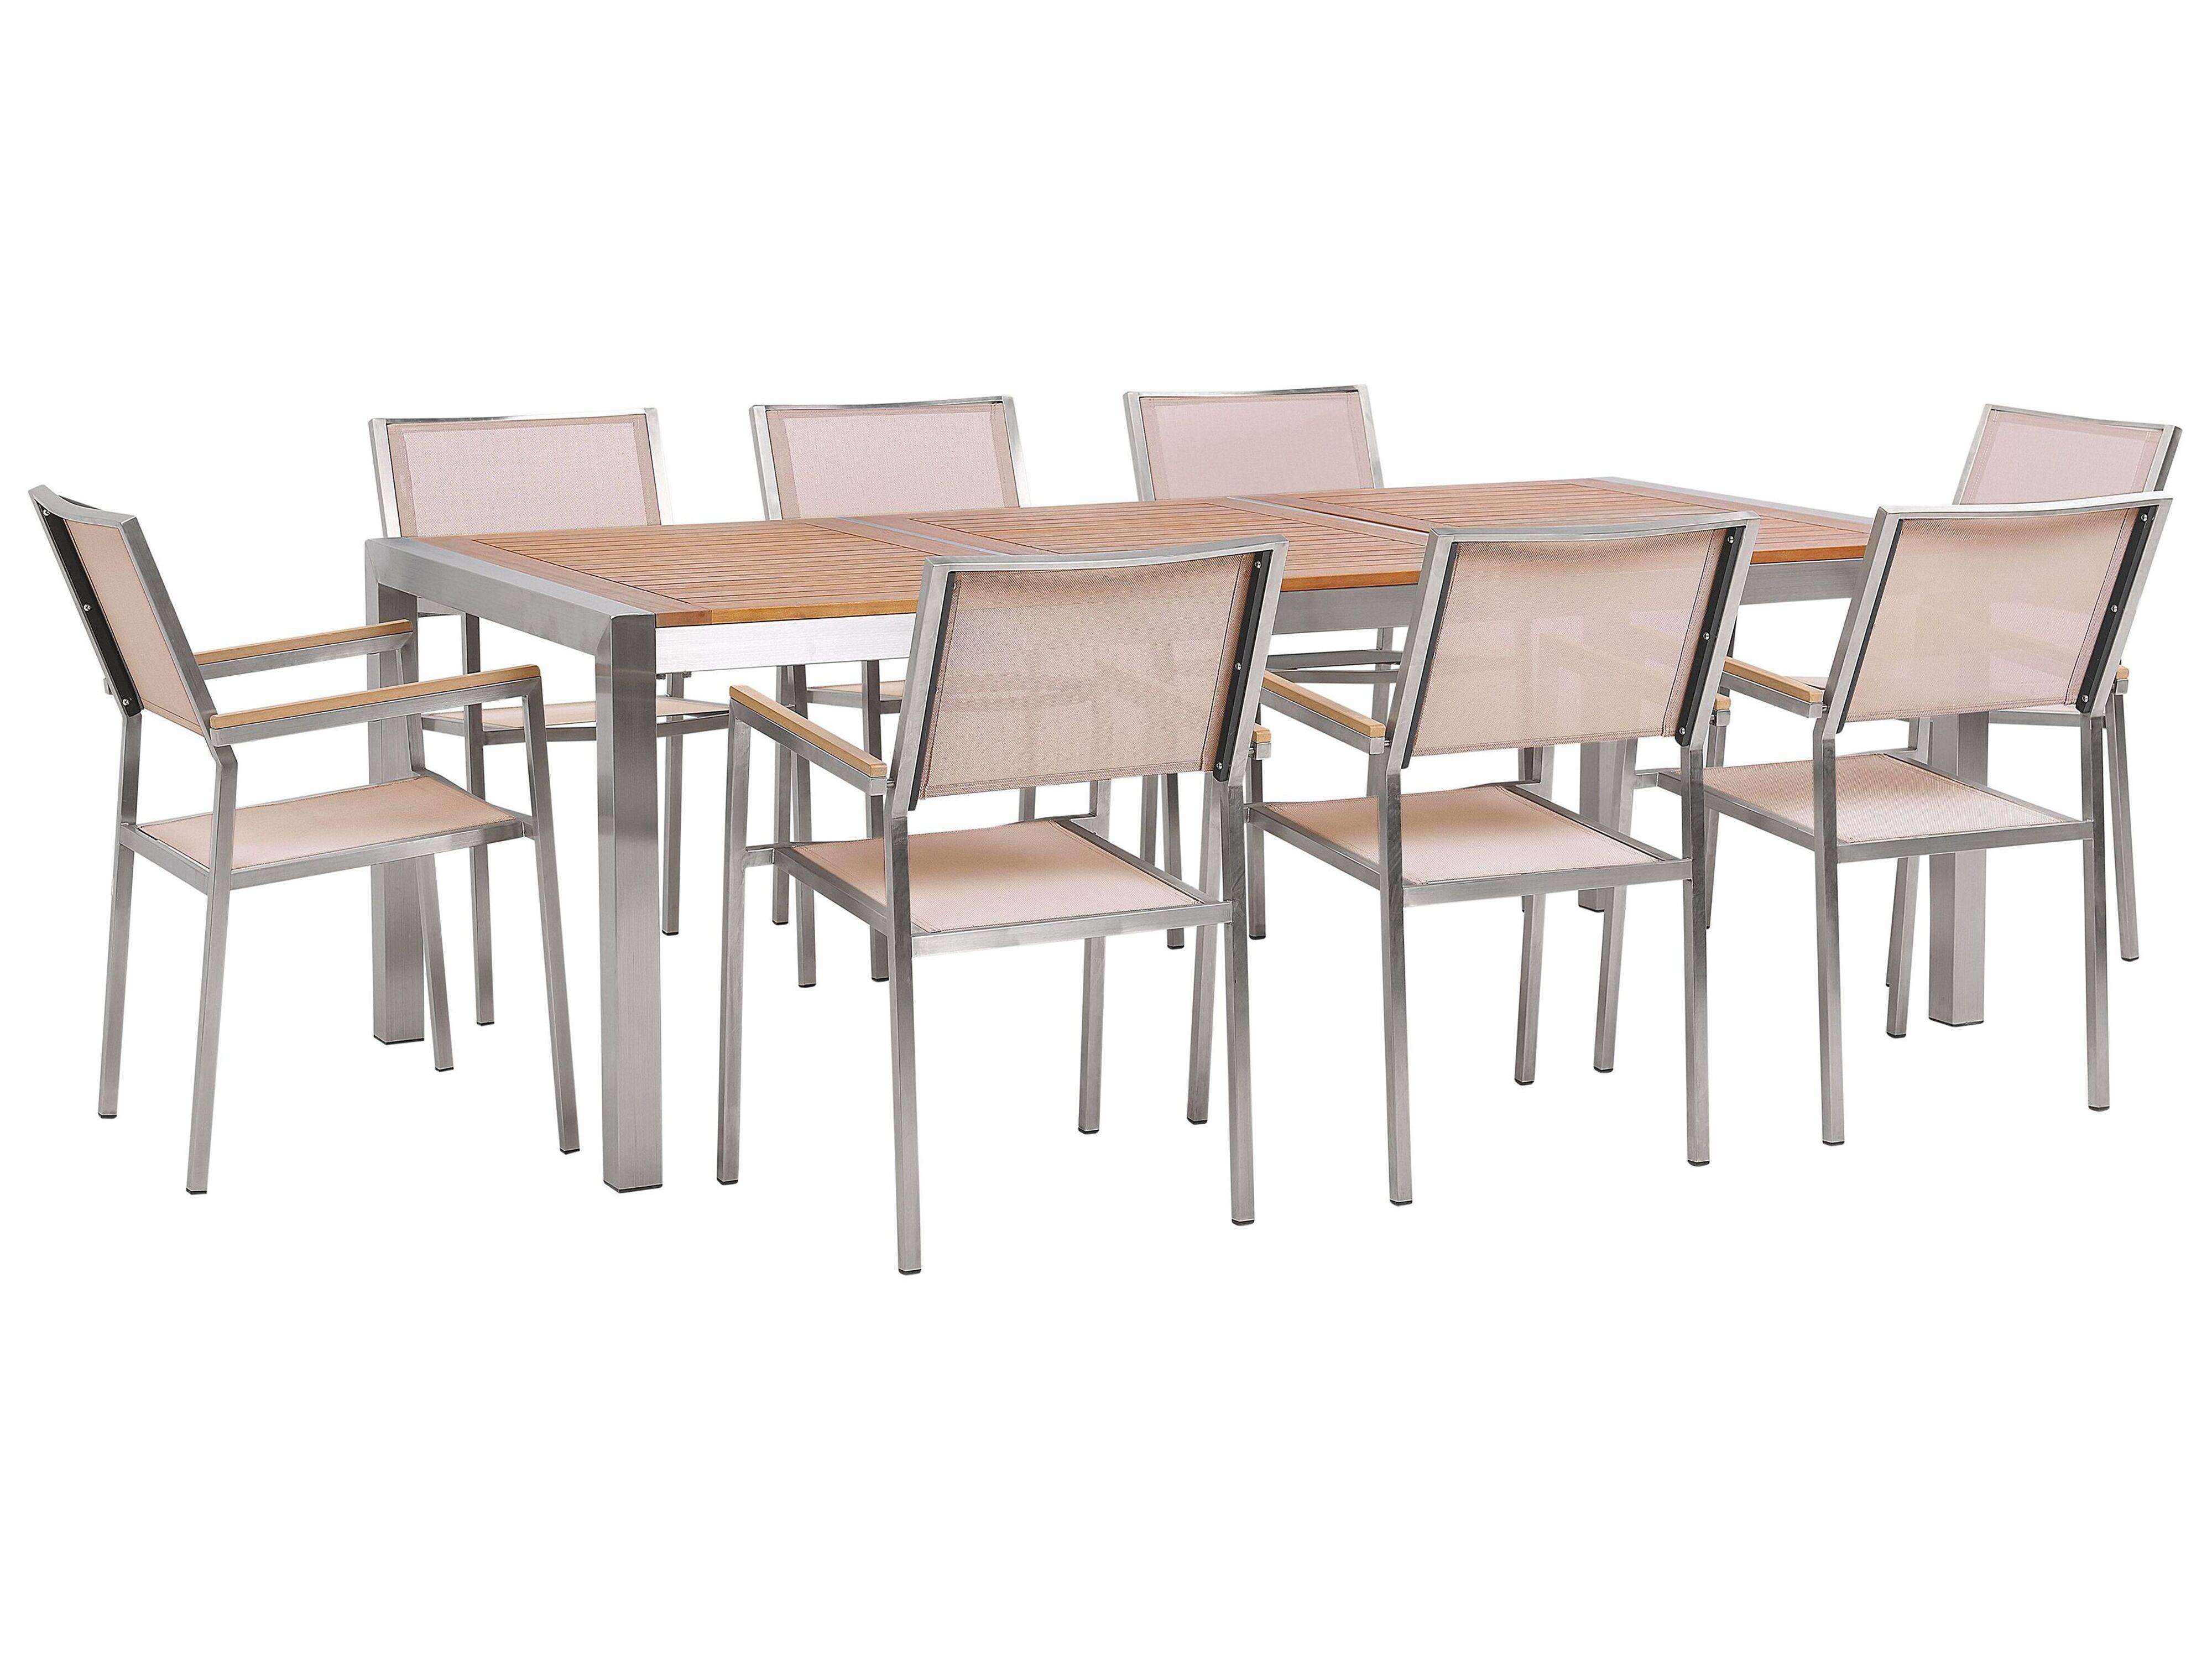 Gartenmobel Set Eukalyptusholz 220 Cm 8 Sitzer Textilbespannung Beige Grosseto Beliani De